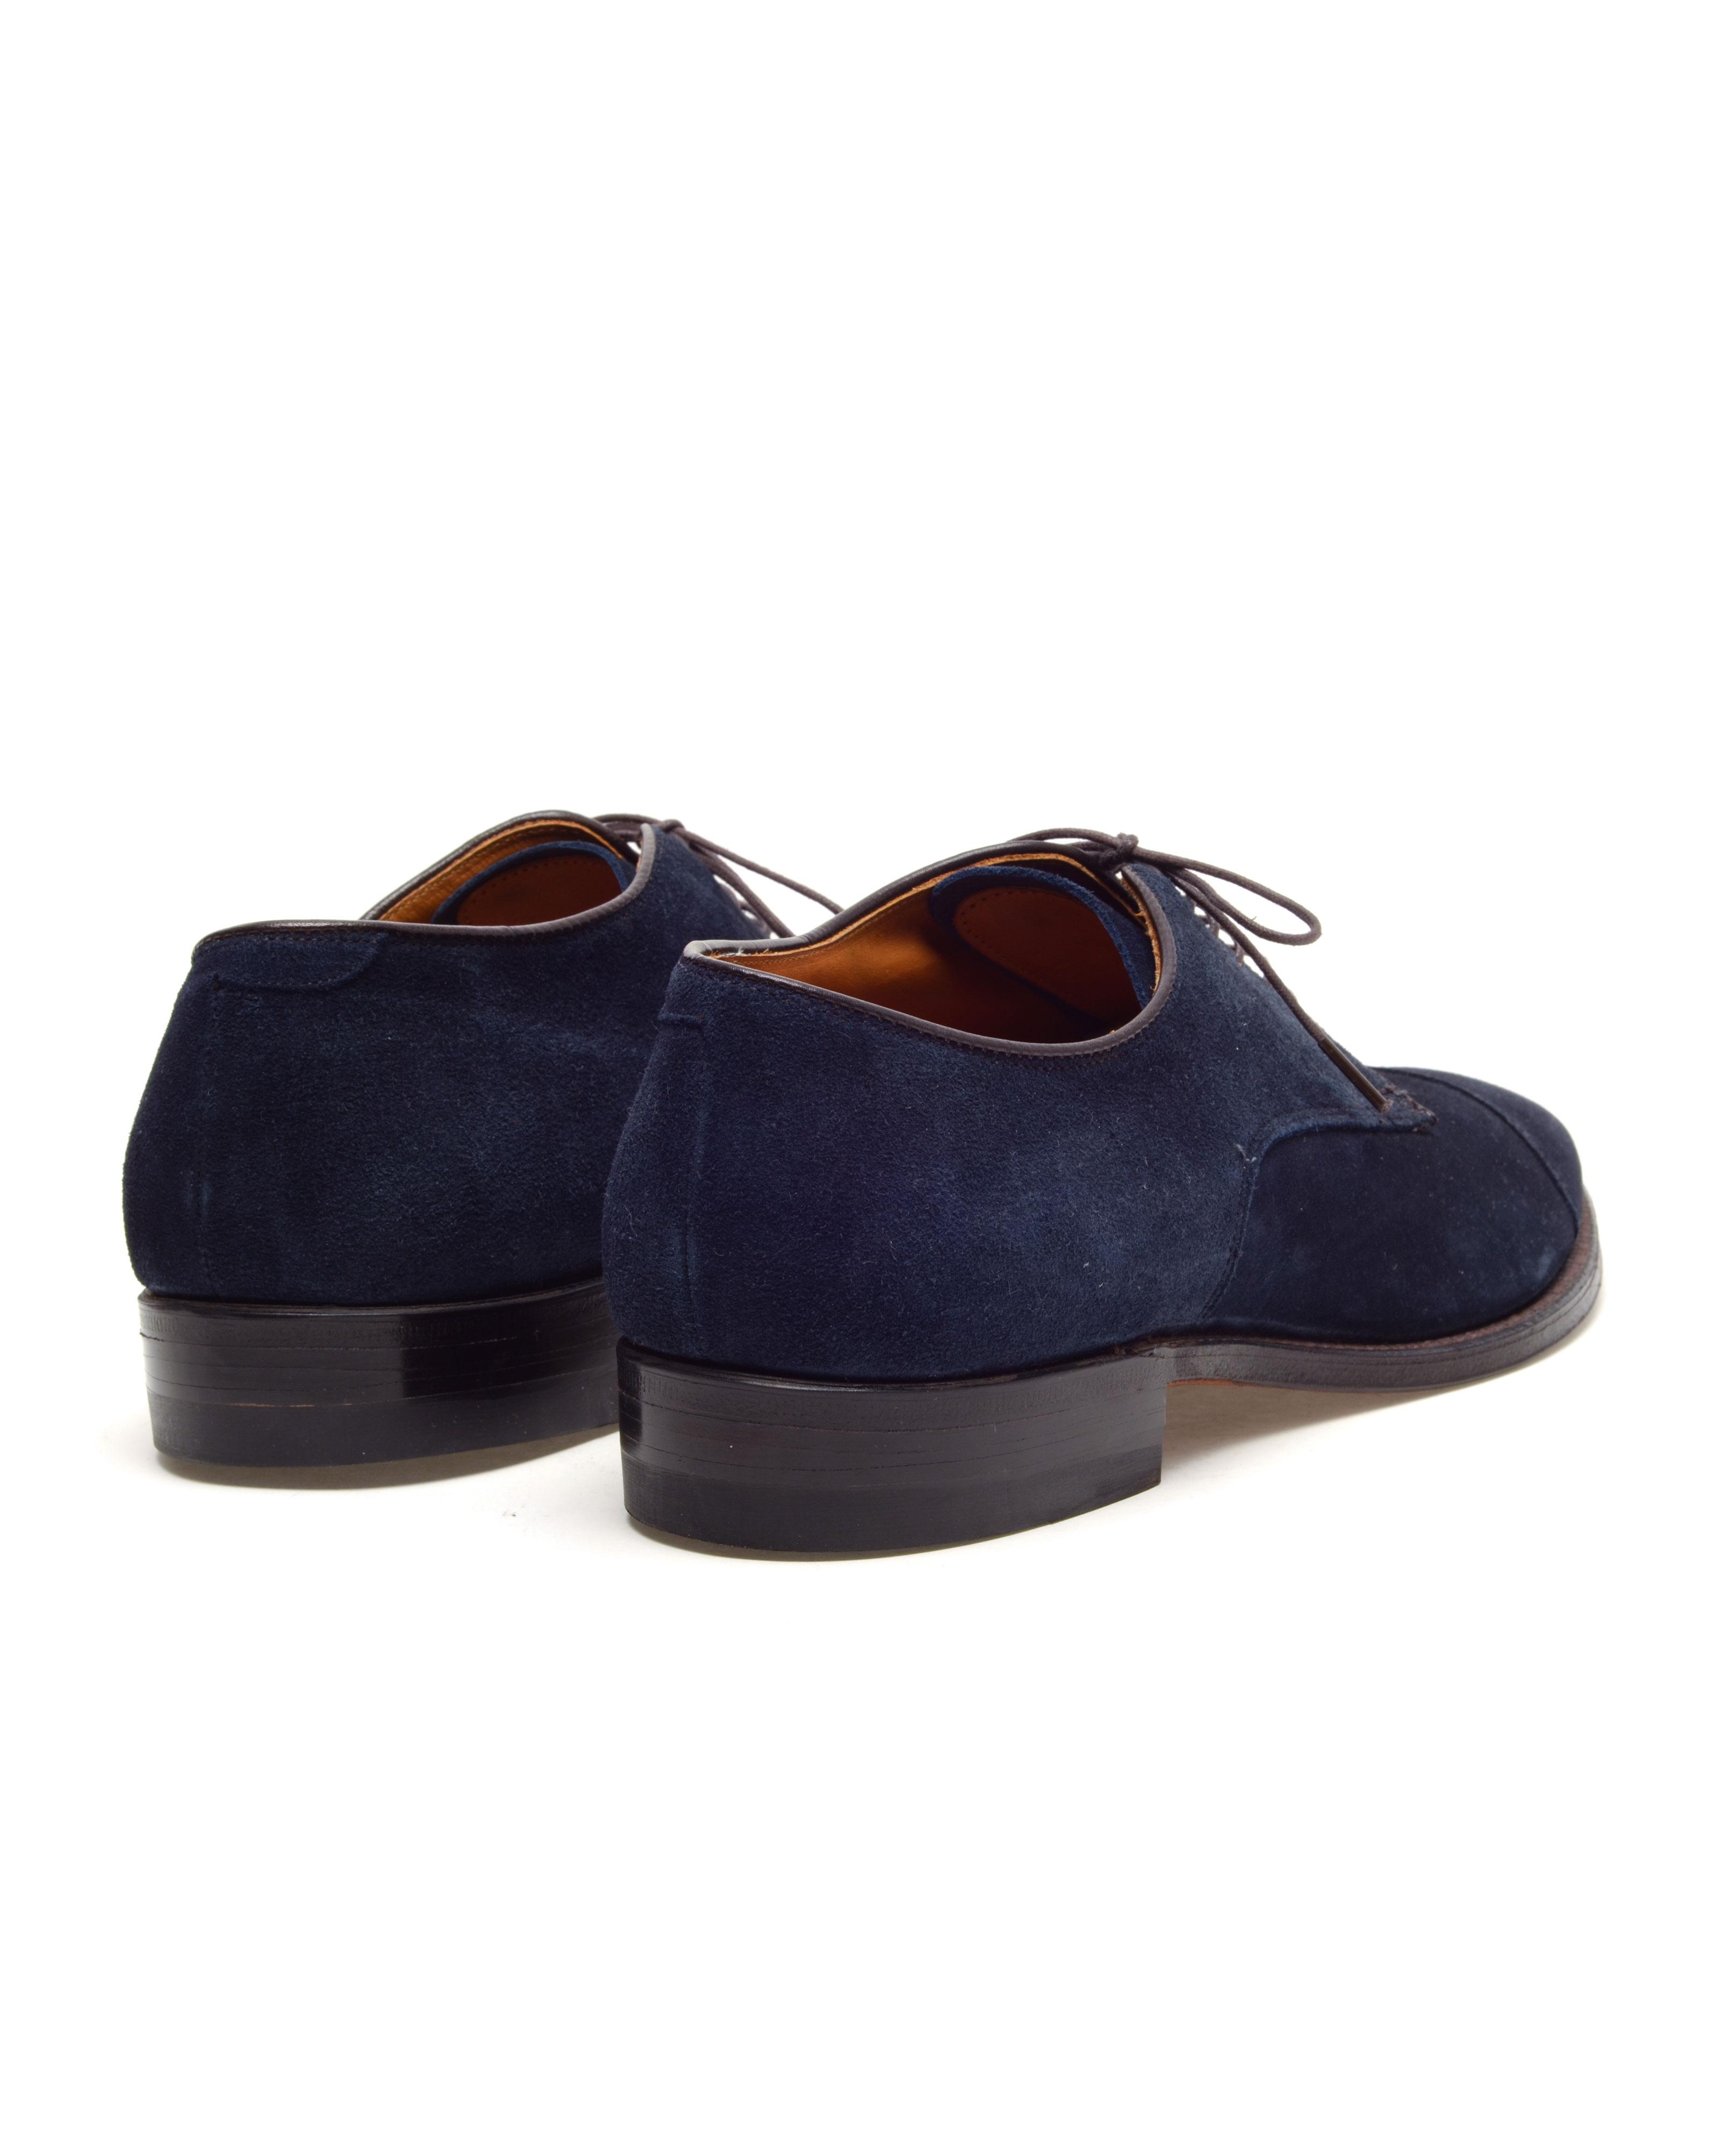 Alden Suede Lace Up Derby Shoes in Blue for Men